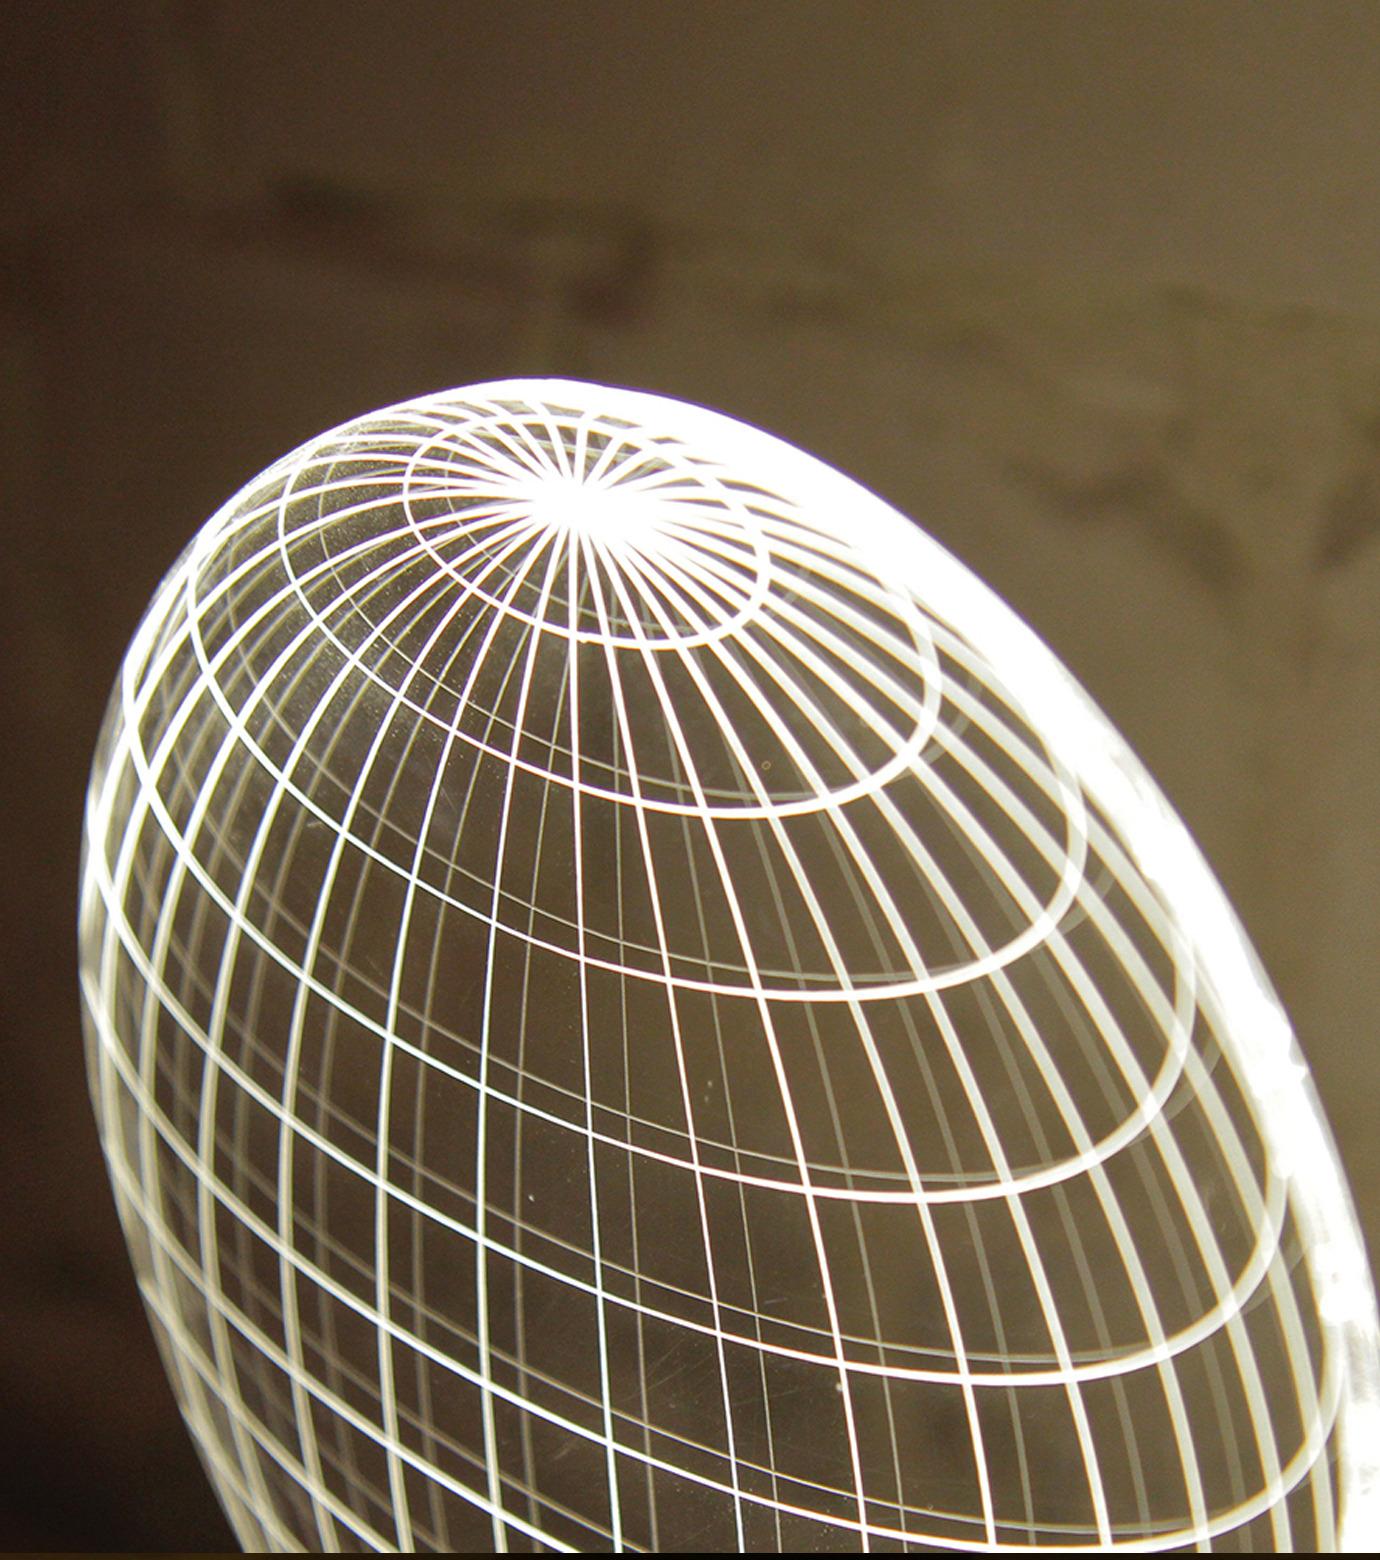 Bulbing(バルビング)のBULBING Lamp-NONE(ライト/light)-480519-0 拡大詳細画像2